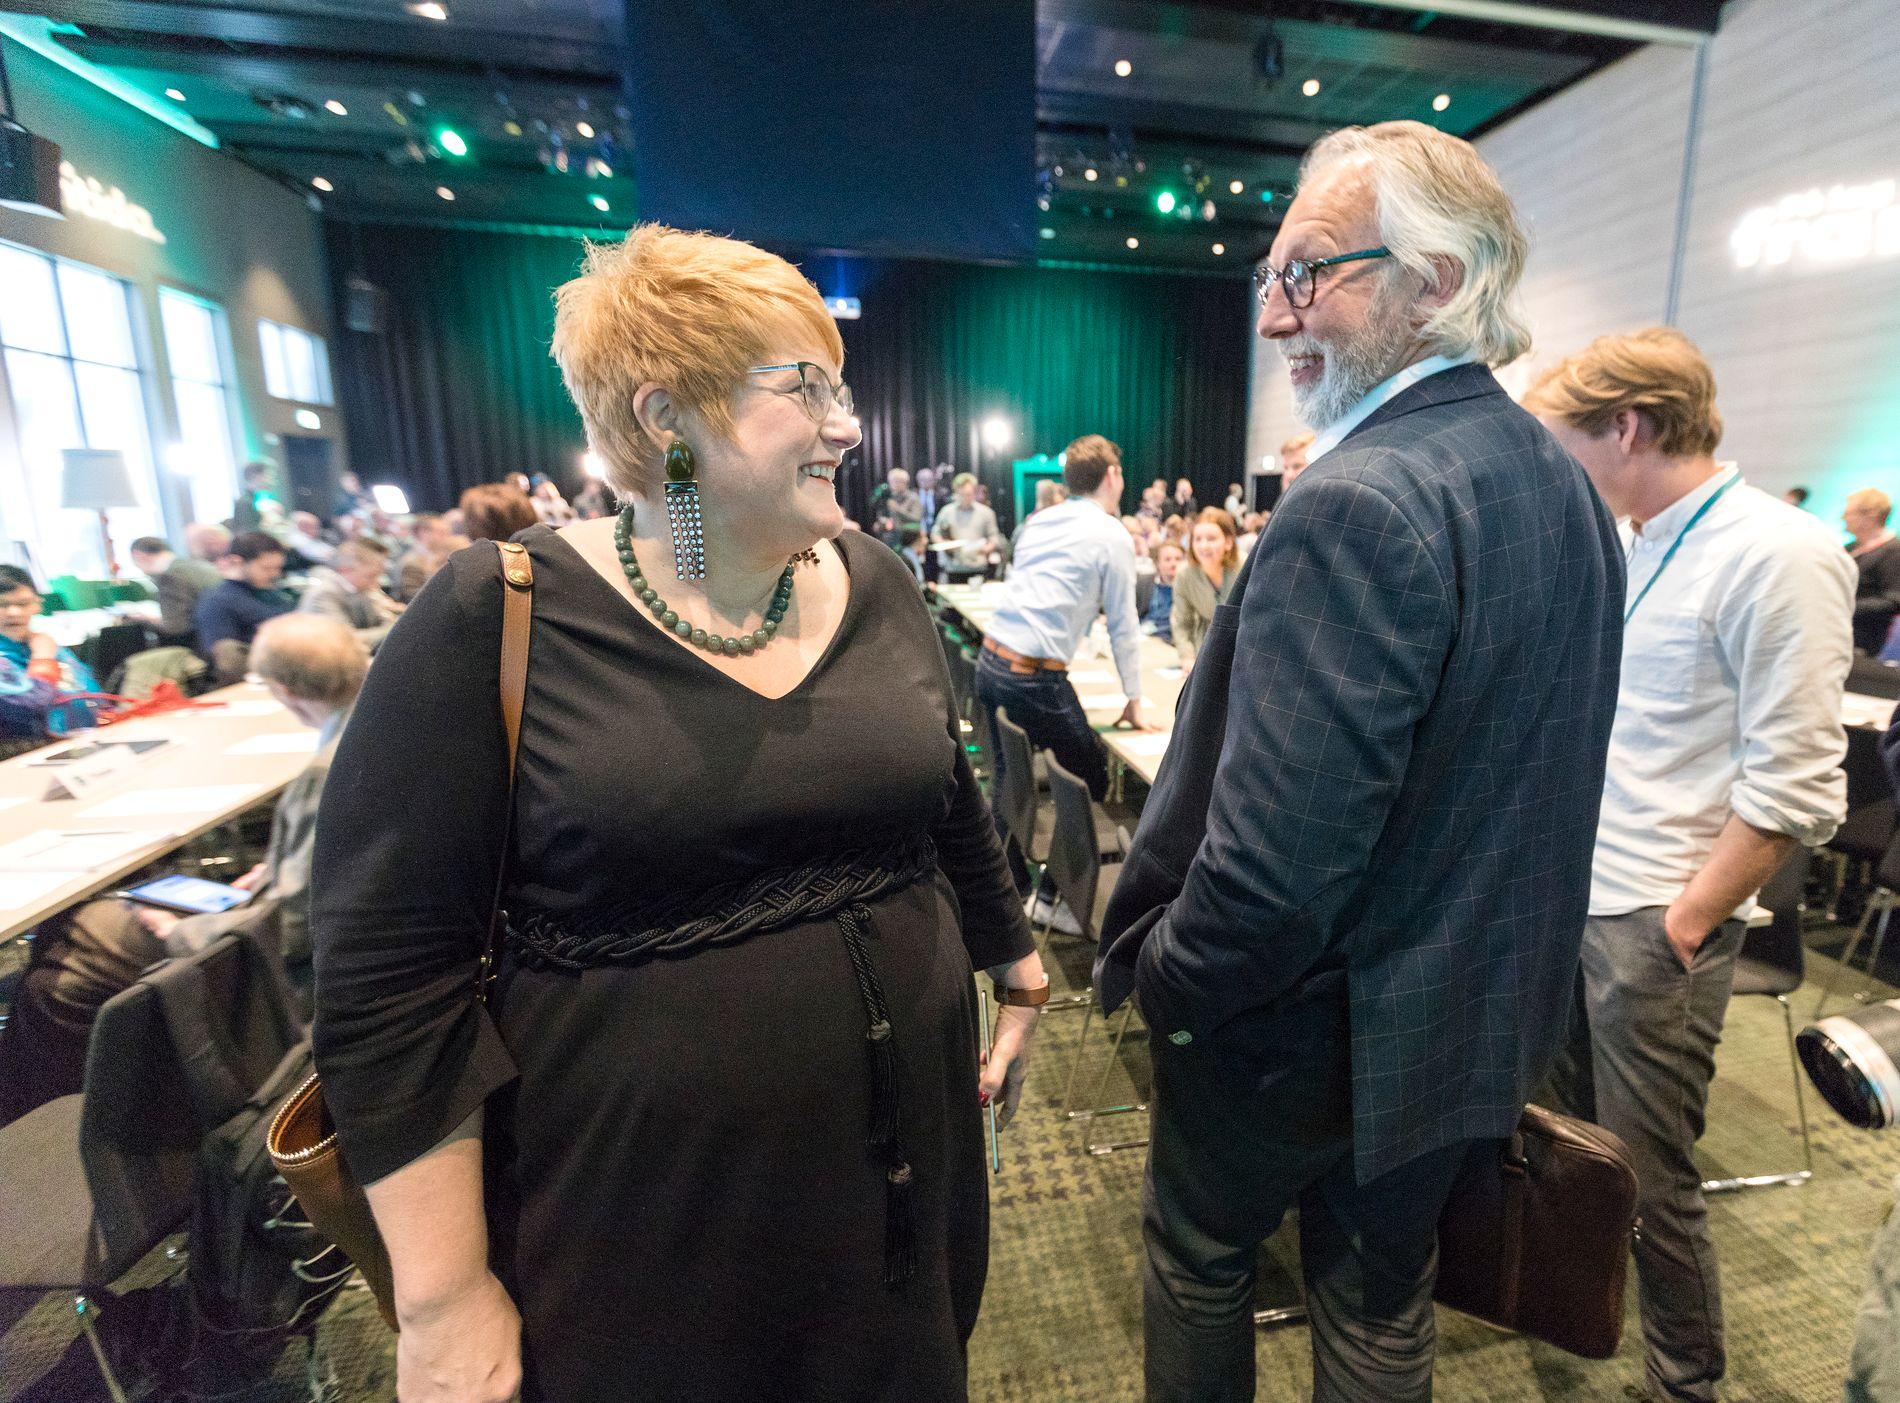 DELT: Stortingsrepresentant Carl-Erik Grimstad (t.h.) tilhører fløyen i Venstre som vil liberalisere norsk narkotikapolitikk. Det ønsker ikke partileder Trine Skei Grande.